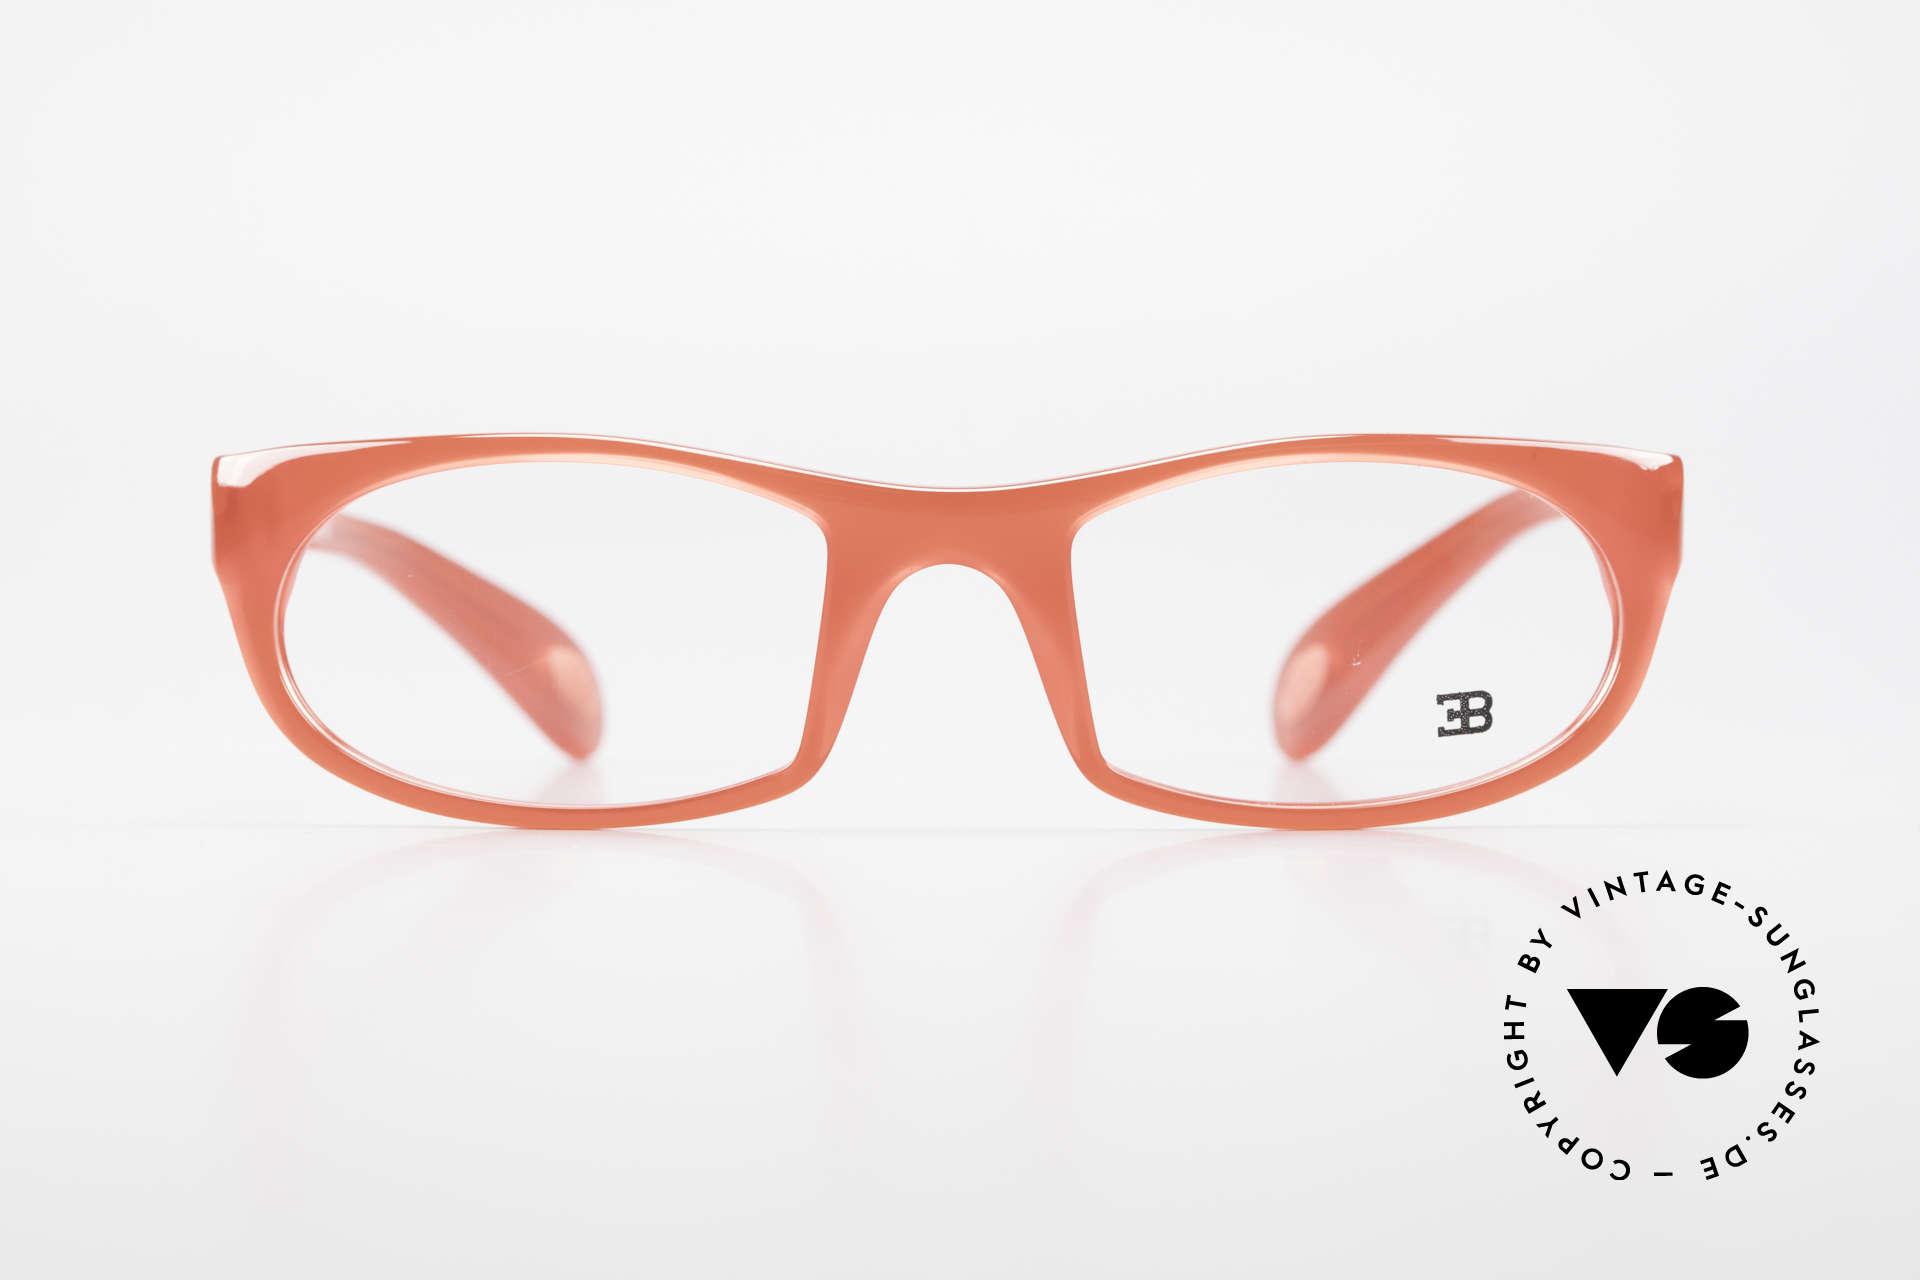 Bugatti 326 Odotype Rare Designer Eyeglass-Frame, distinctive design of the ODOTYPE SERIES, Made for Men and Women